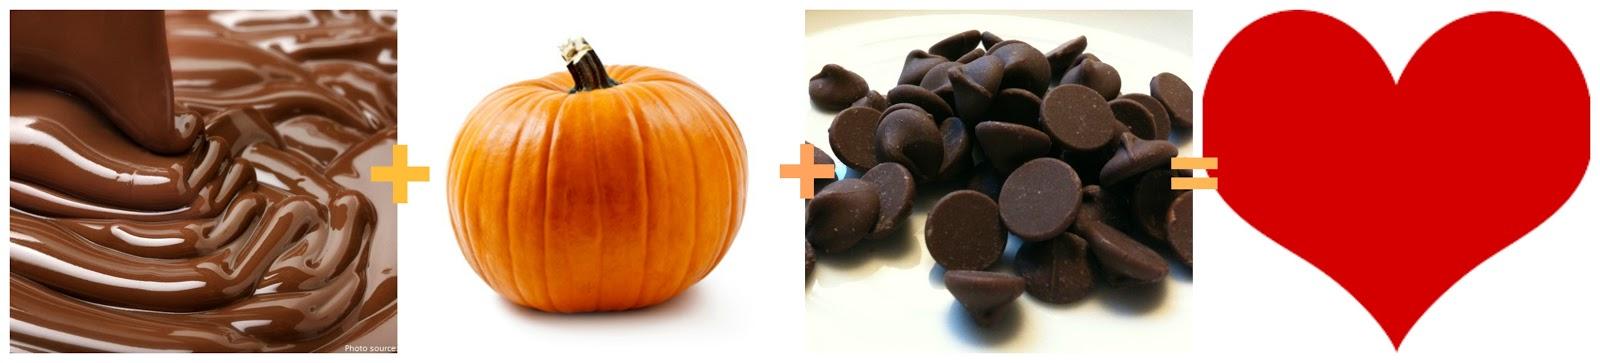 Sharing More Pumpkin Love